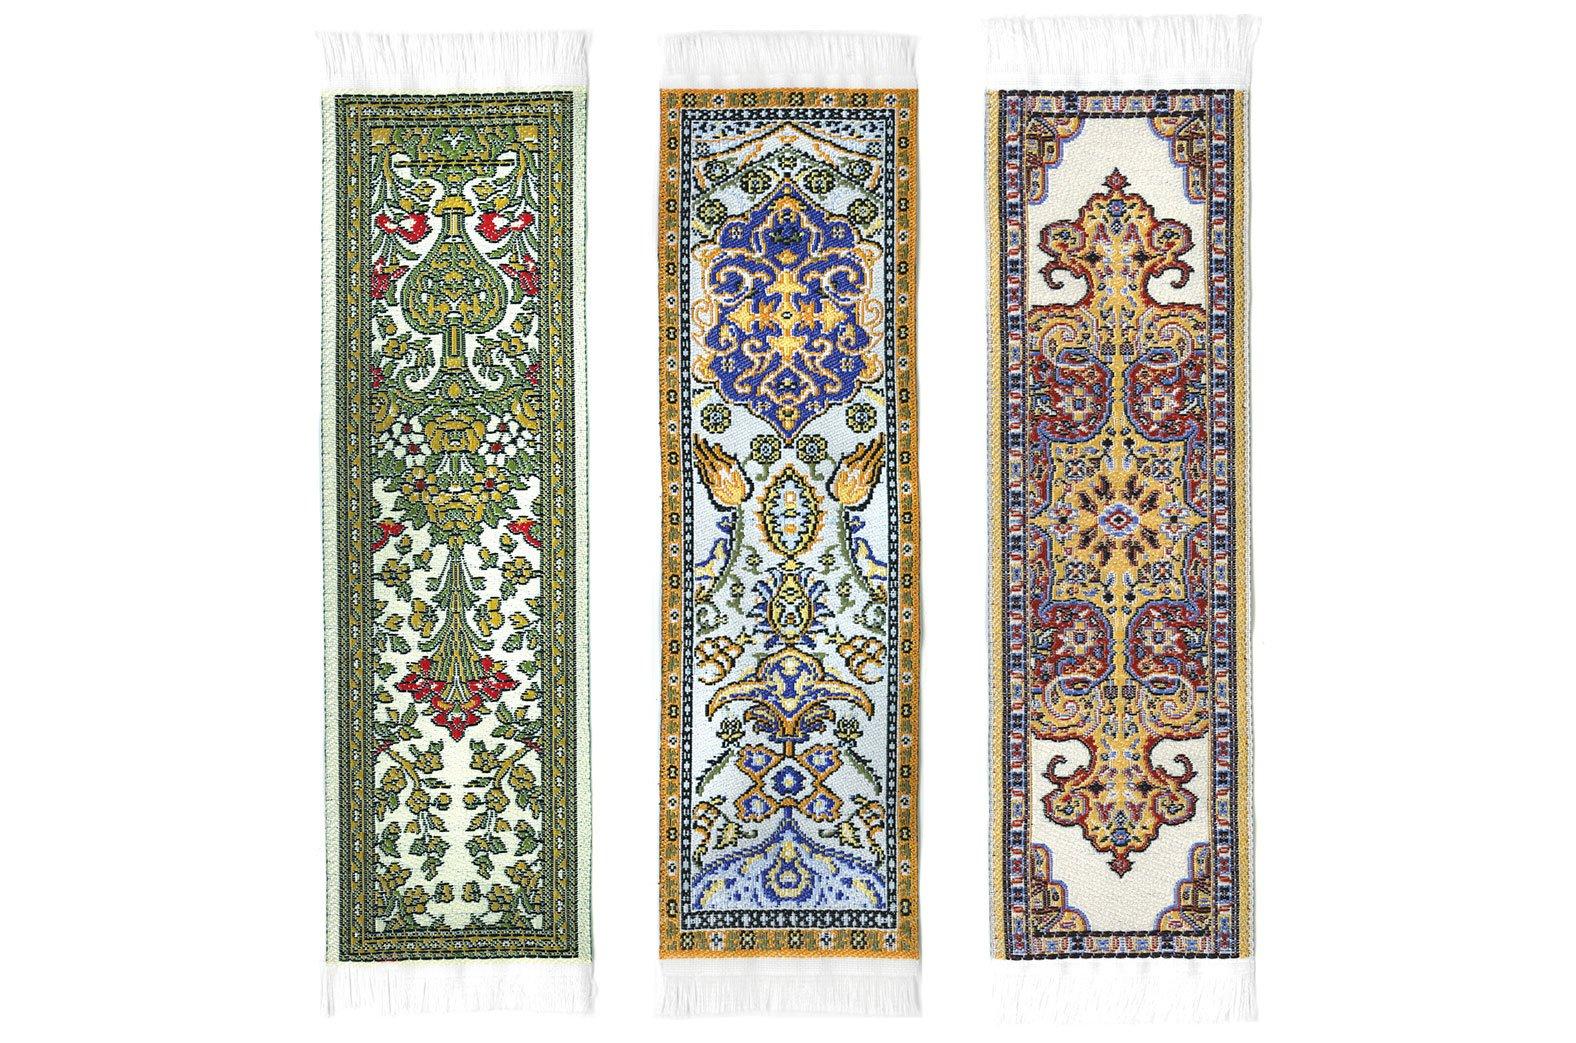 Oriental Carpet Woven Fabric Bookmark - Beige Collection - 3 bookmark designs